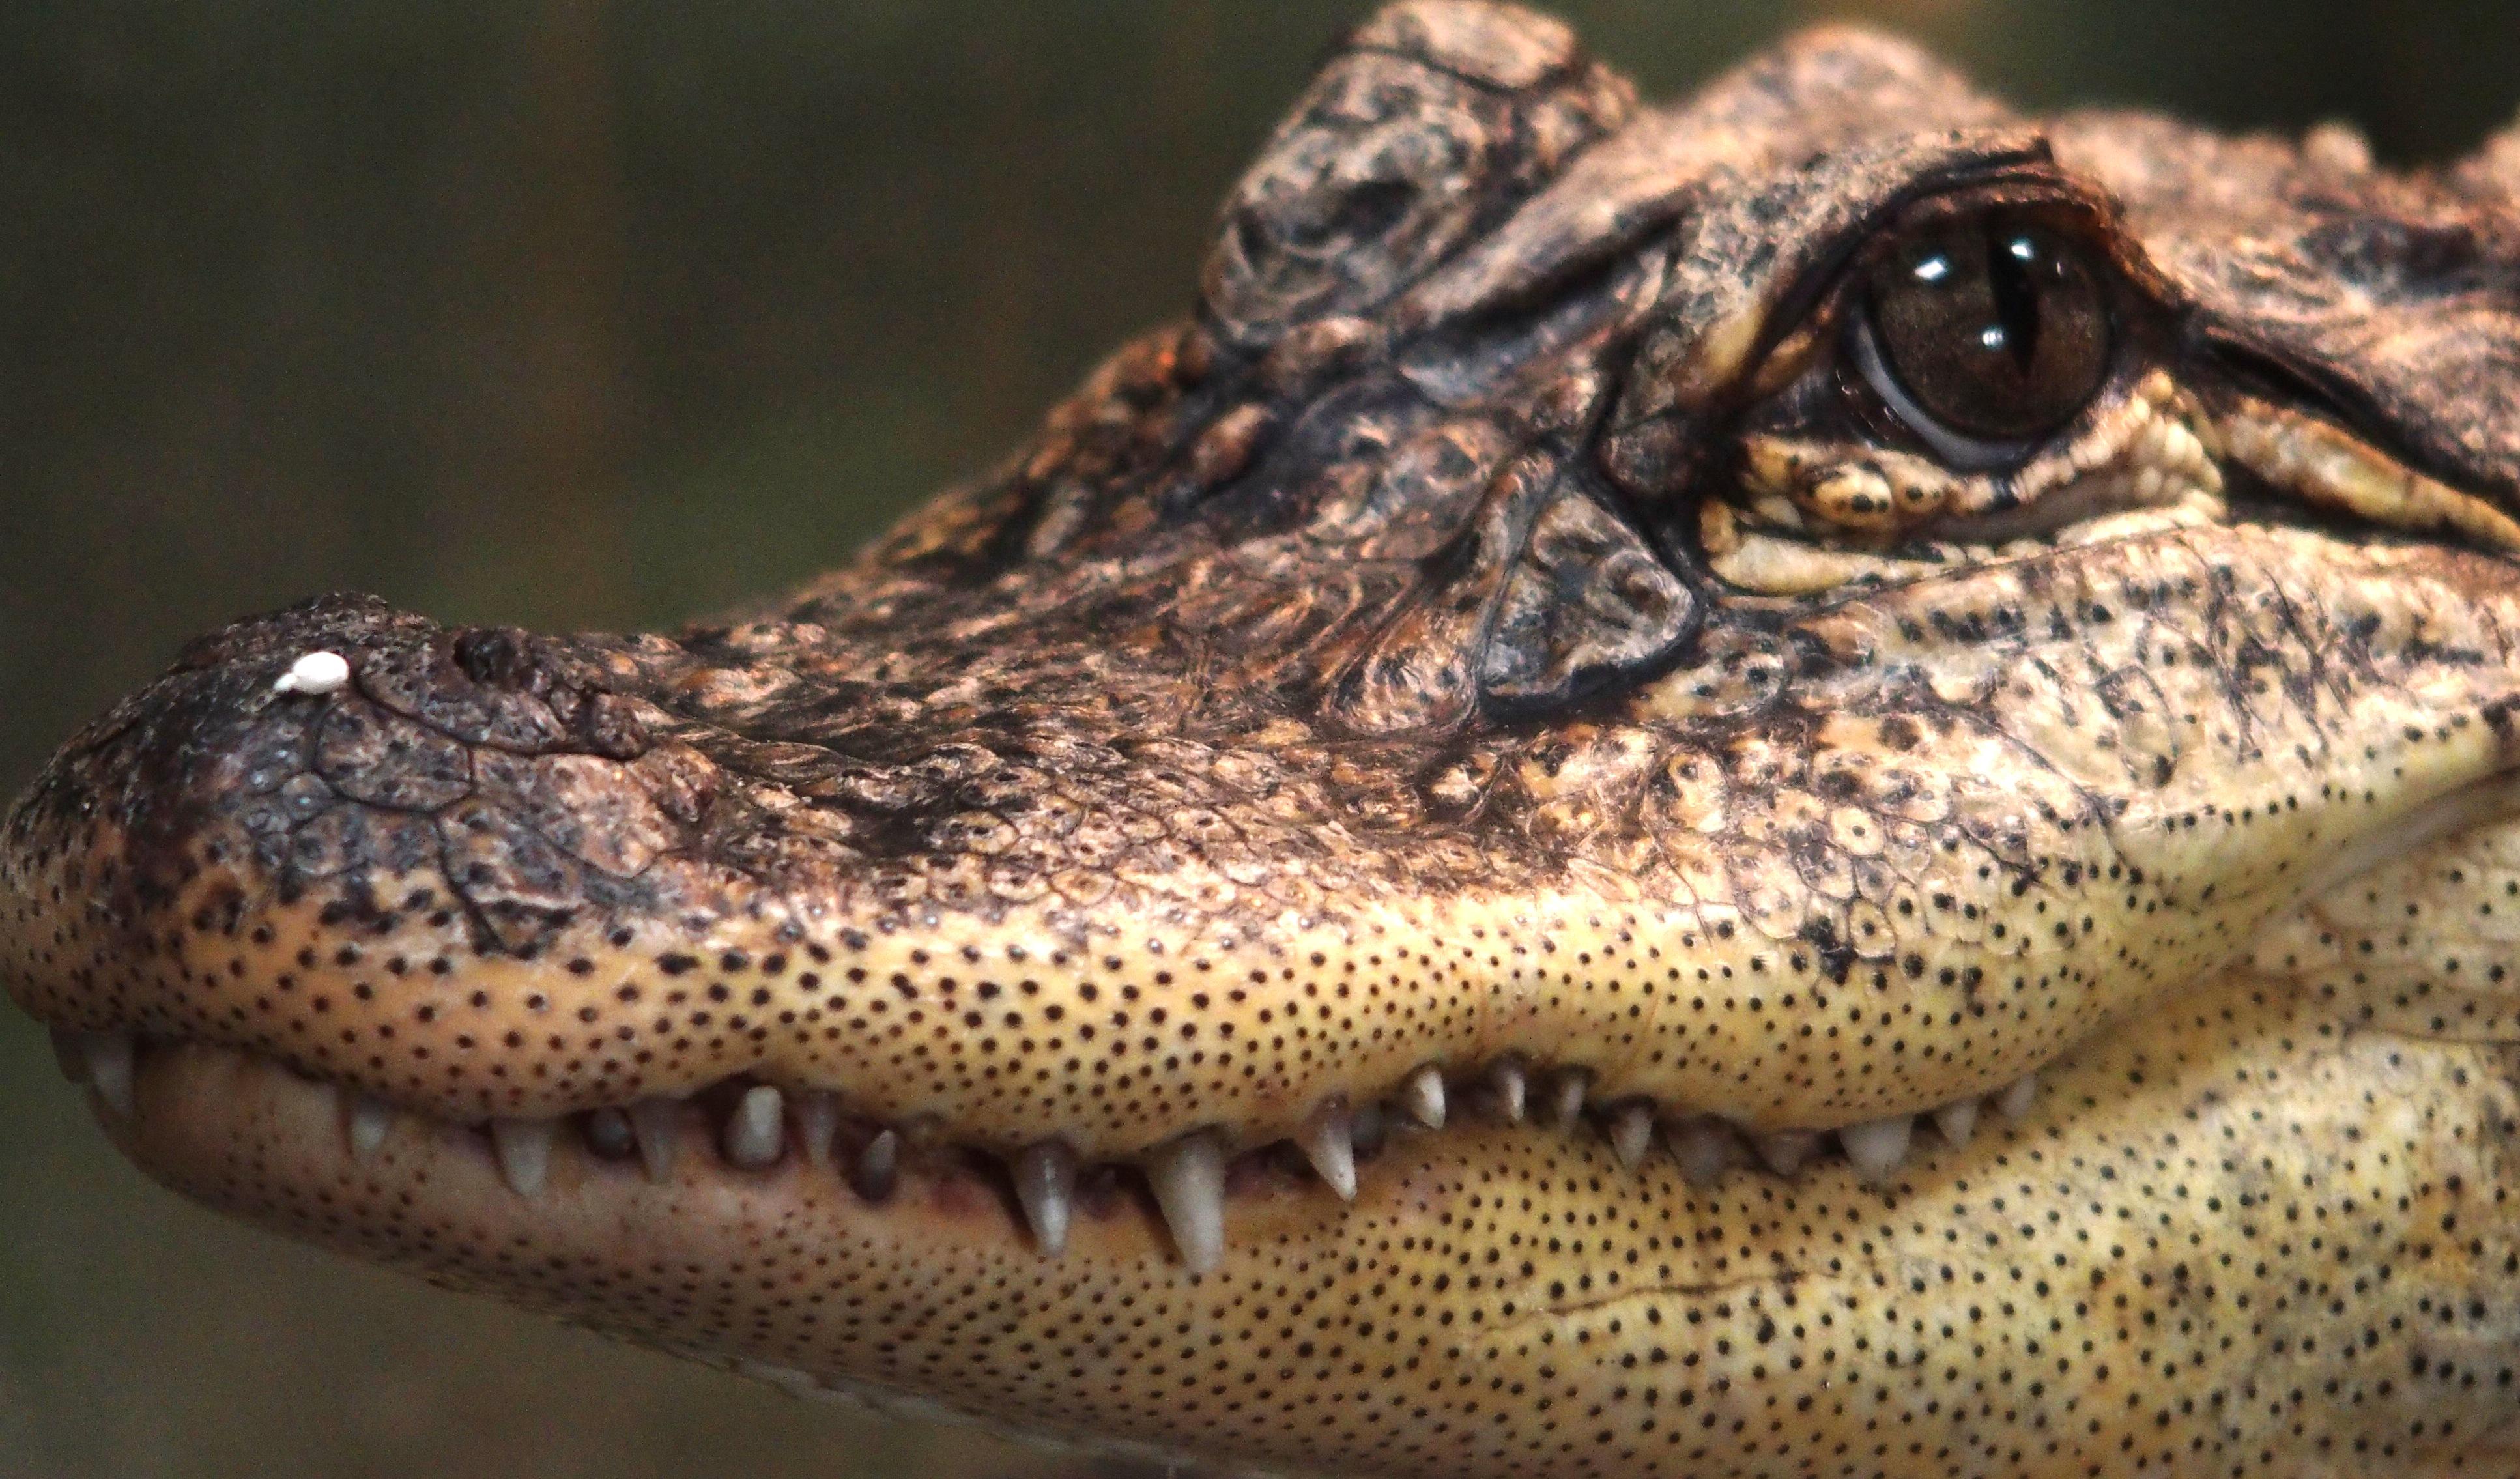 Alligator vs Crocodile | zoologicalsocietyofauckland